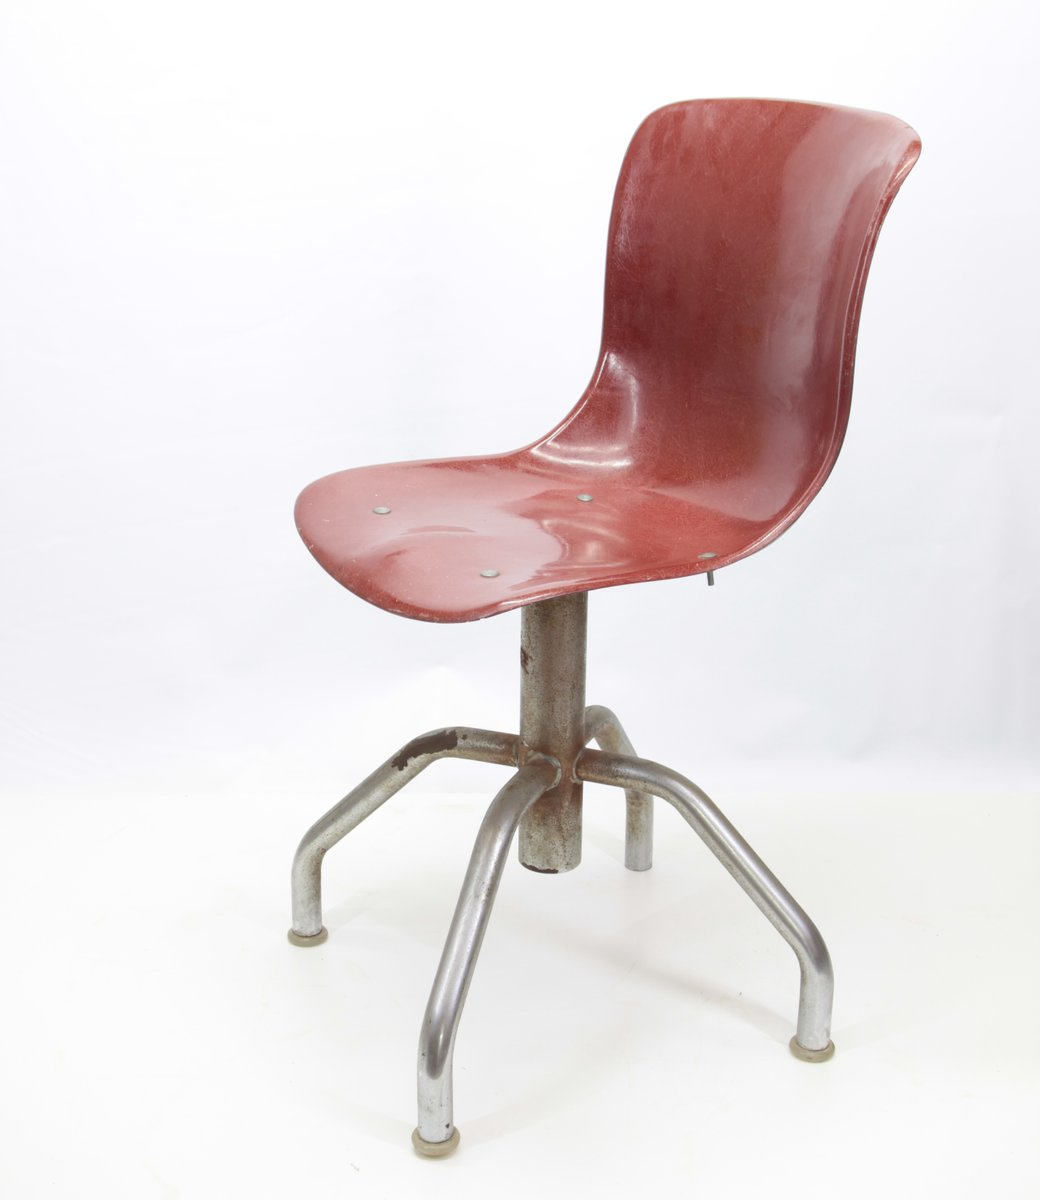 Italian Plastic Metal Office Chair